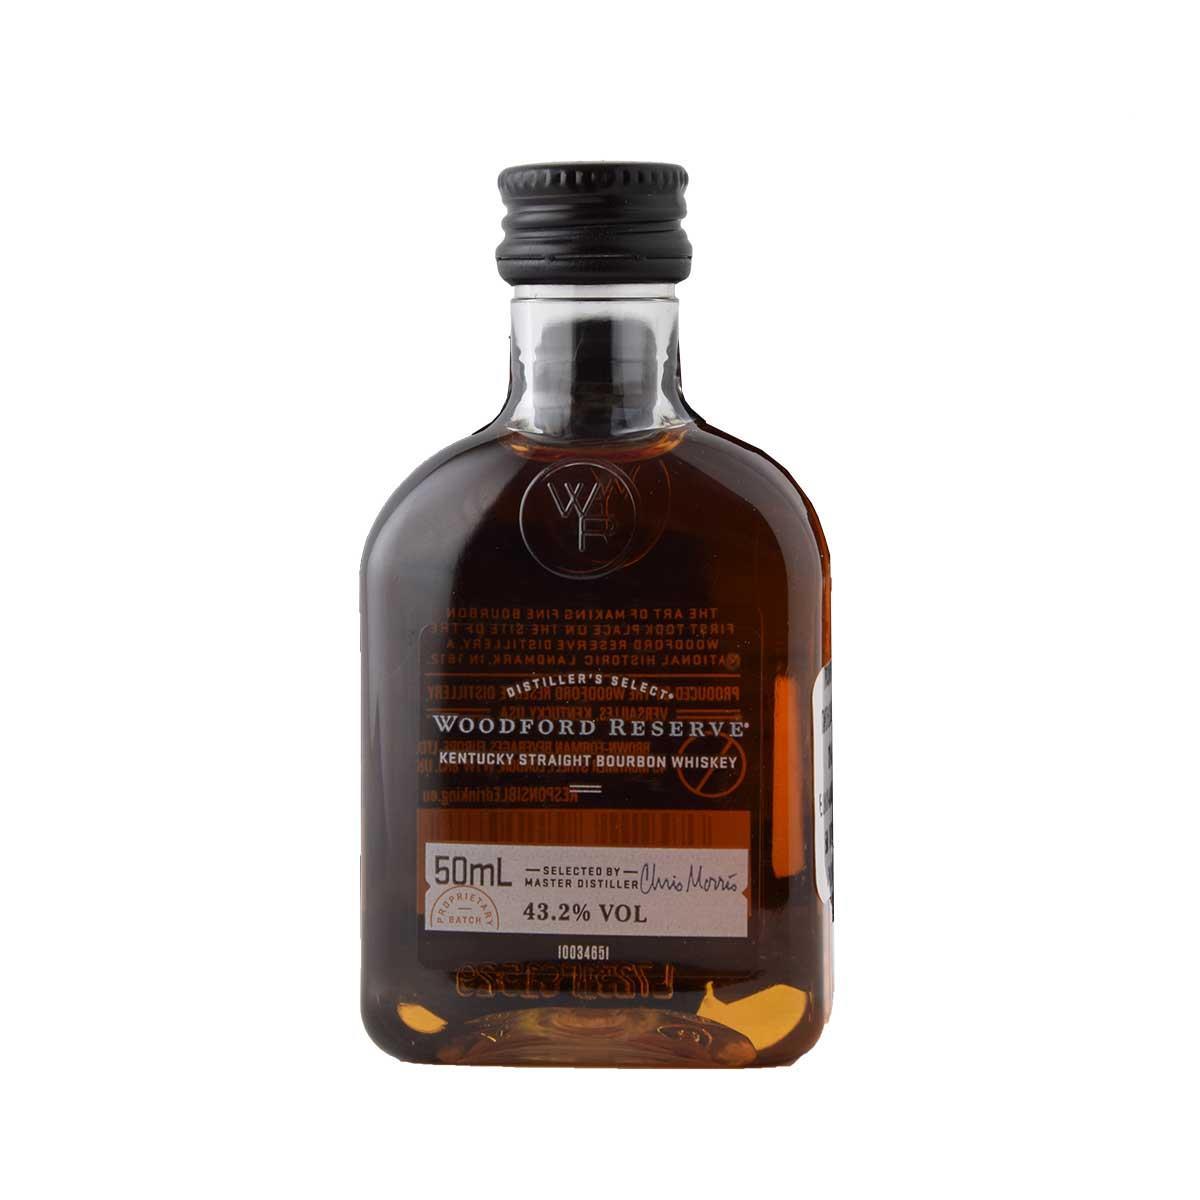 Woodford Reserve Bourbon 50ml